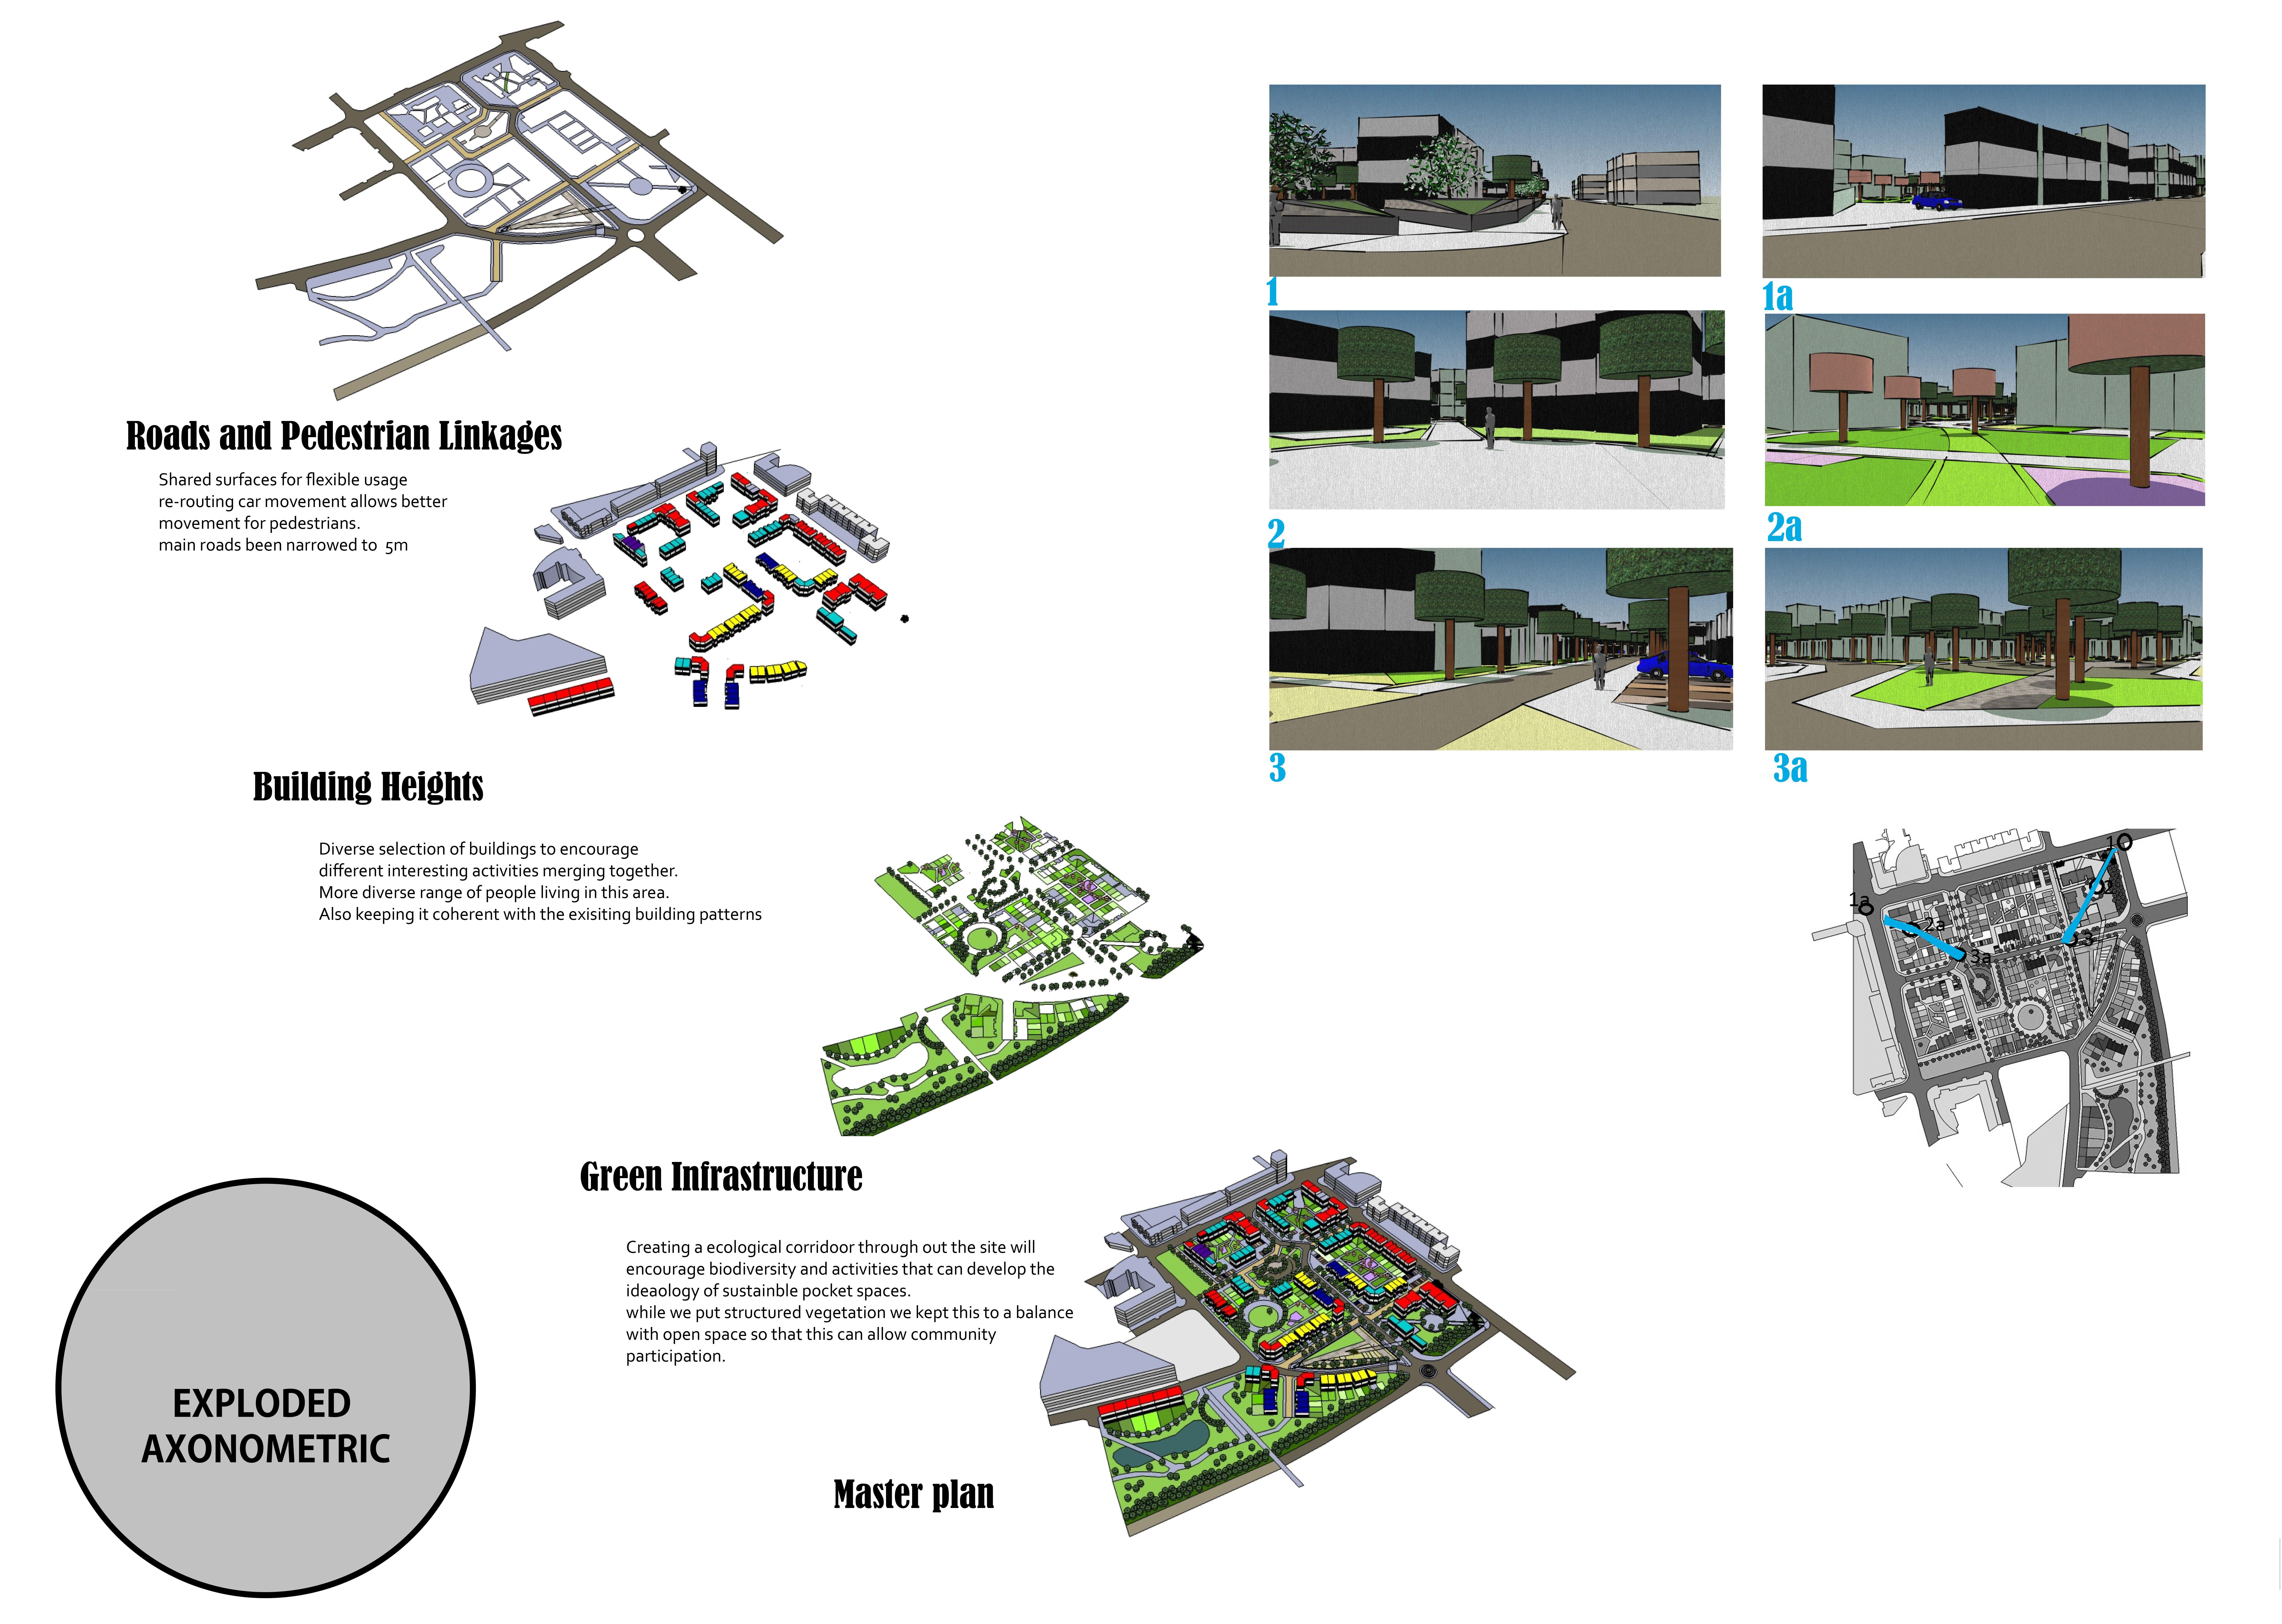 exploded axonometric diagram/drawing | architecture_images ... landscape diagram